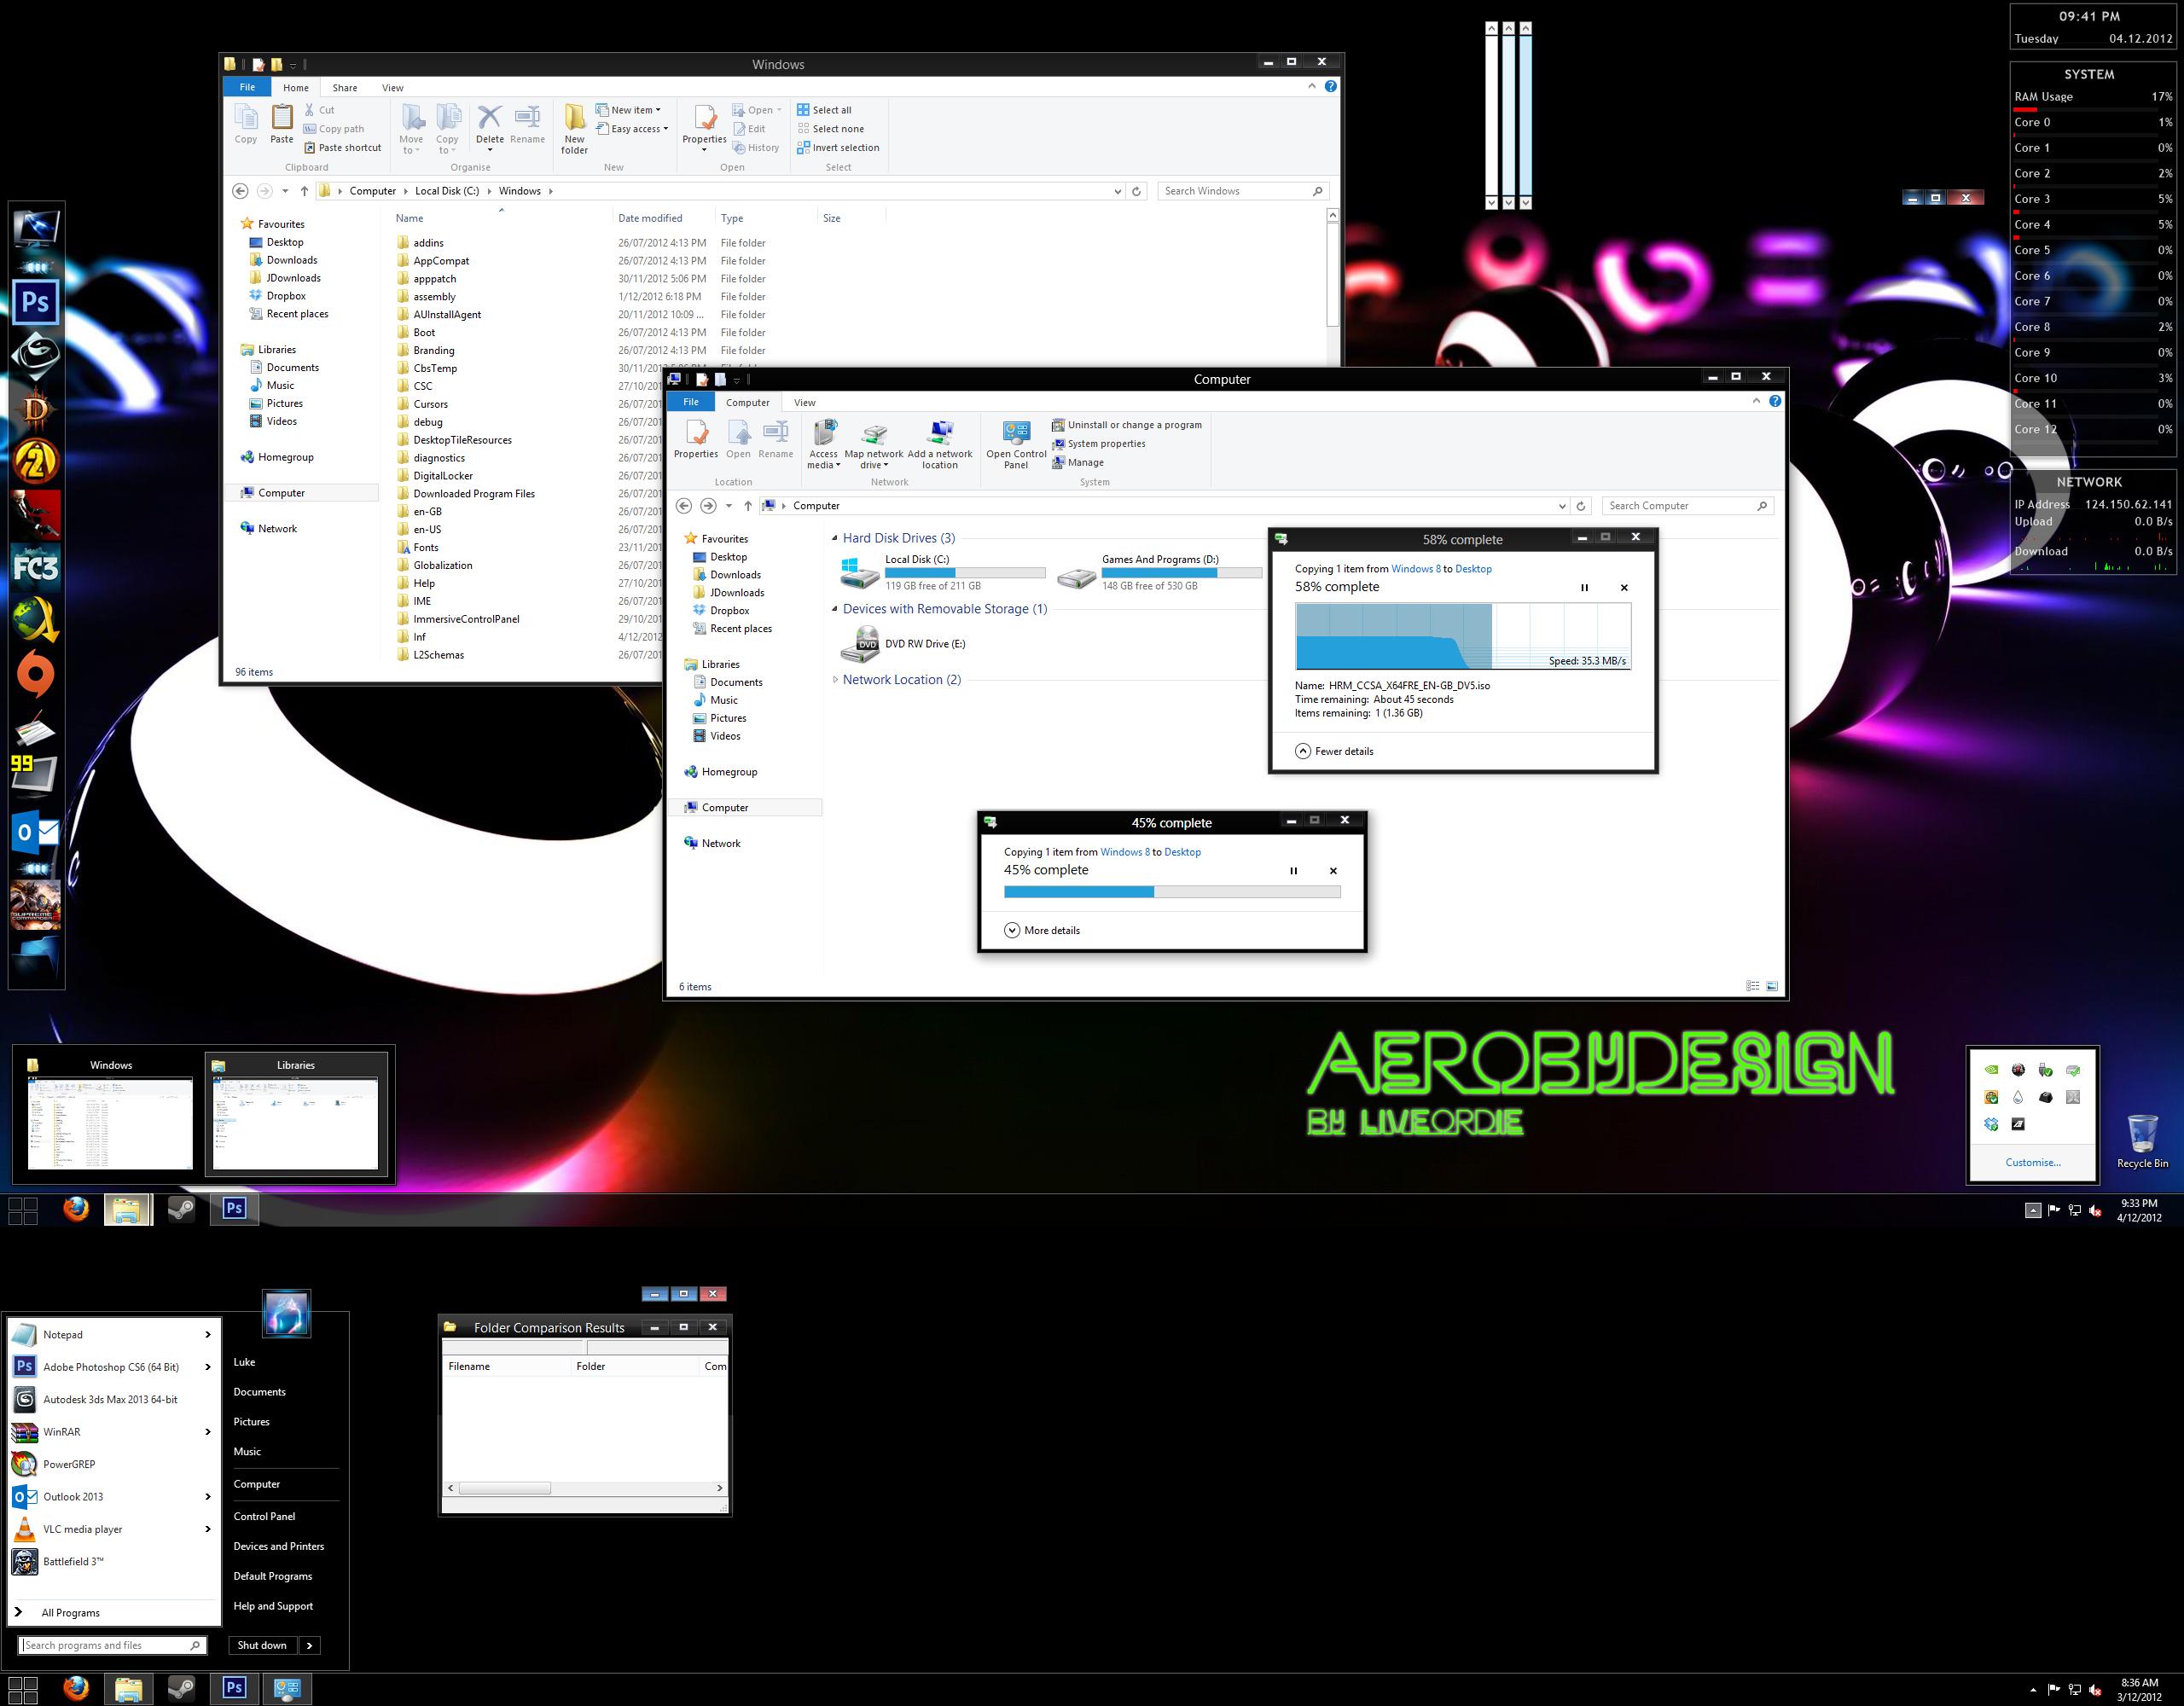 AeroByDesign For Windows 8